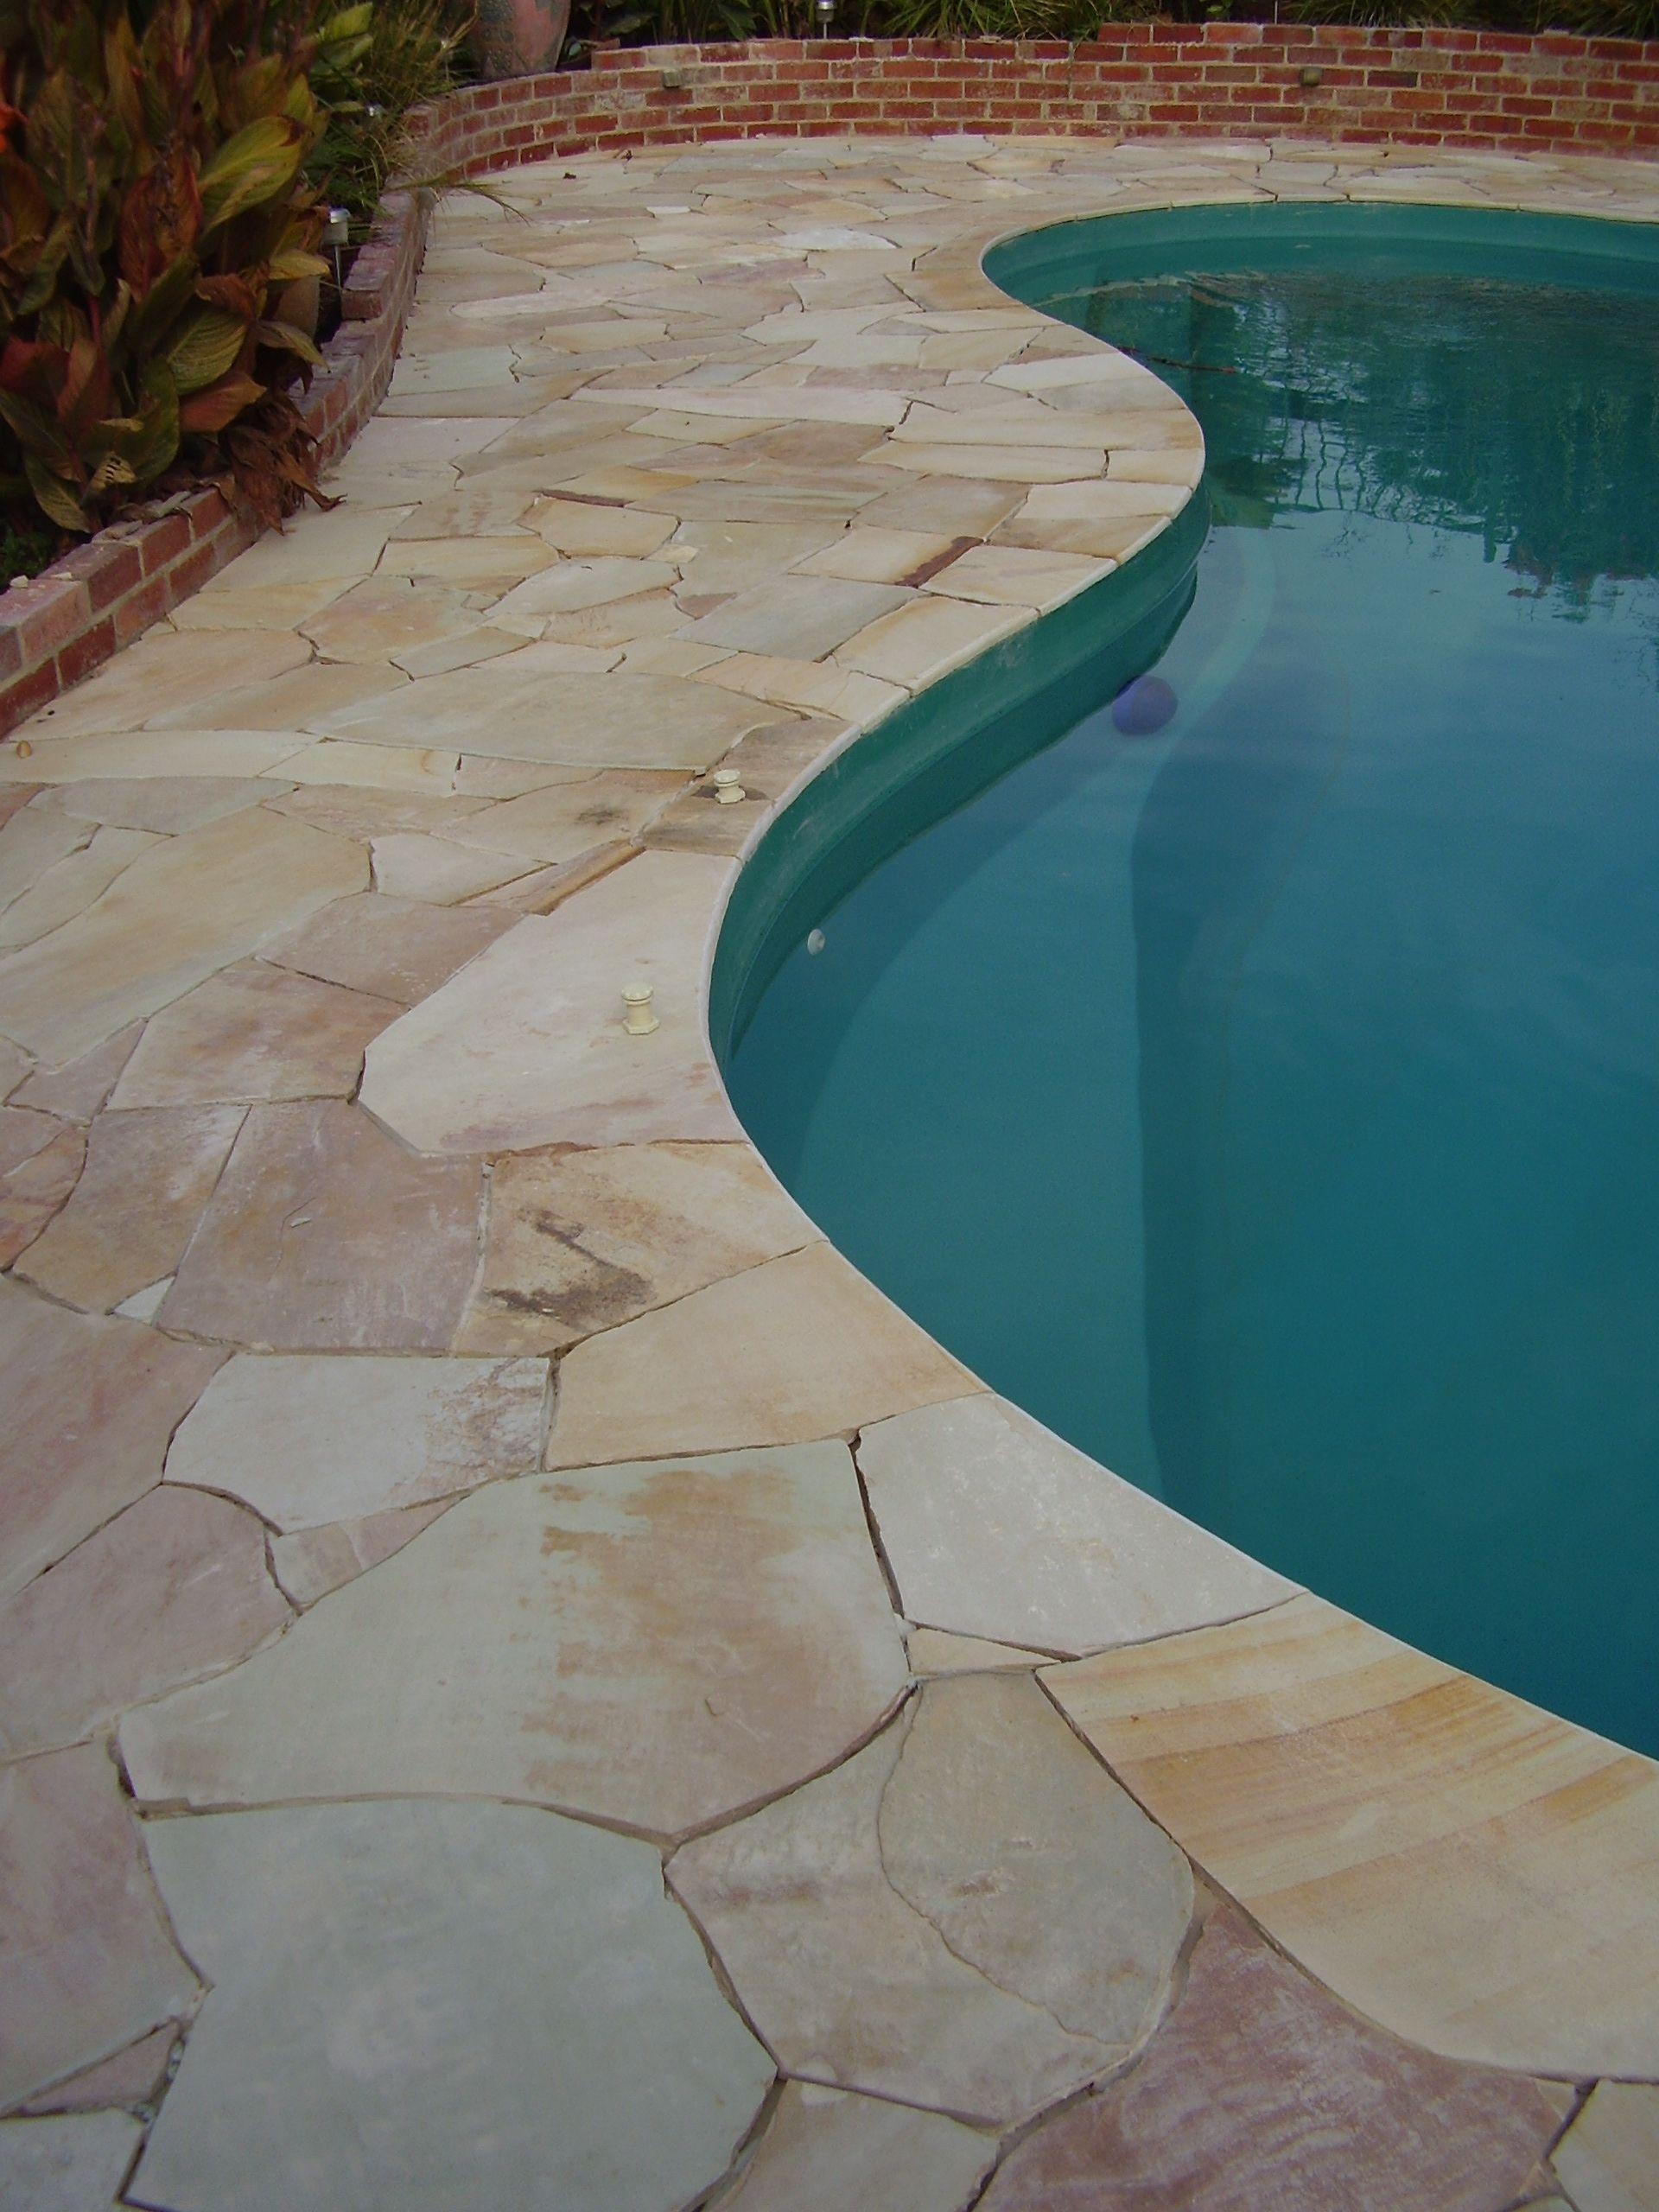 Travertine Bluestone Sandstone Granite Stack Stone Cobblestone Pavers Tiles Paving Pool Coping Outdoor Tiles Wall And Floor Tiles Stone Cladding Me Pool Paving Crazy Paving Flagstone Pool Decks